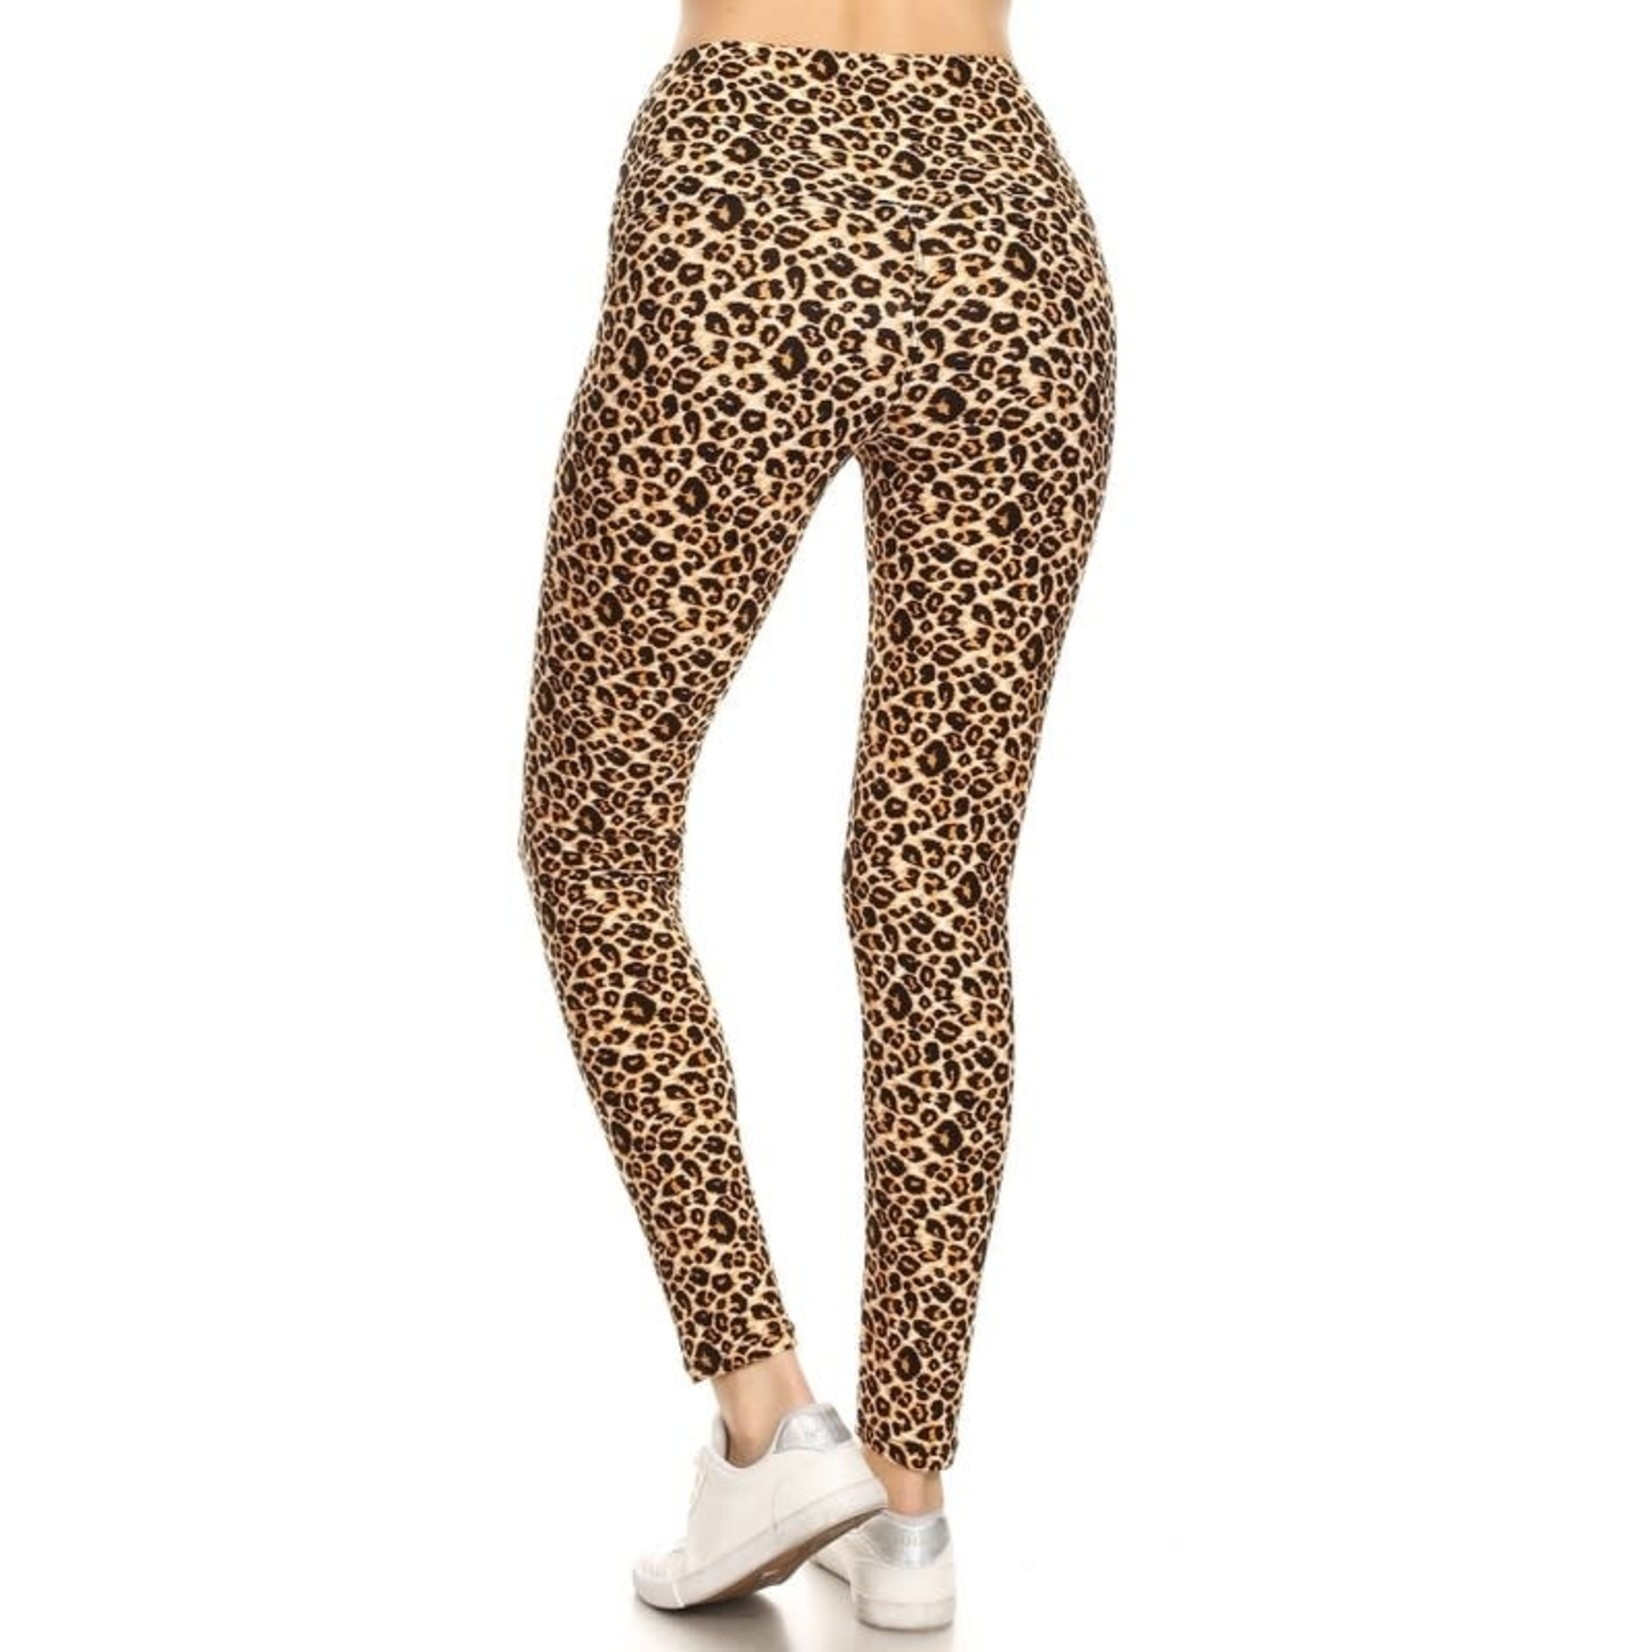 LOVE IT Yoga Leopard Leggings